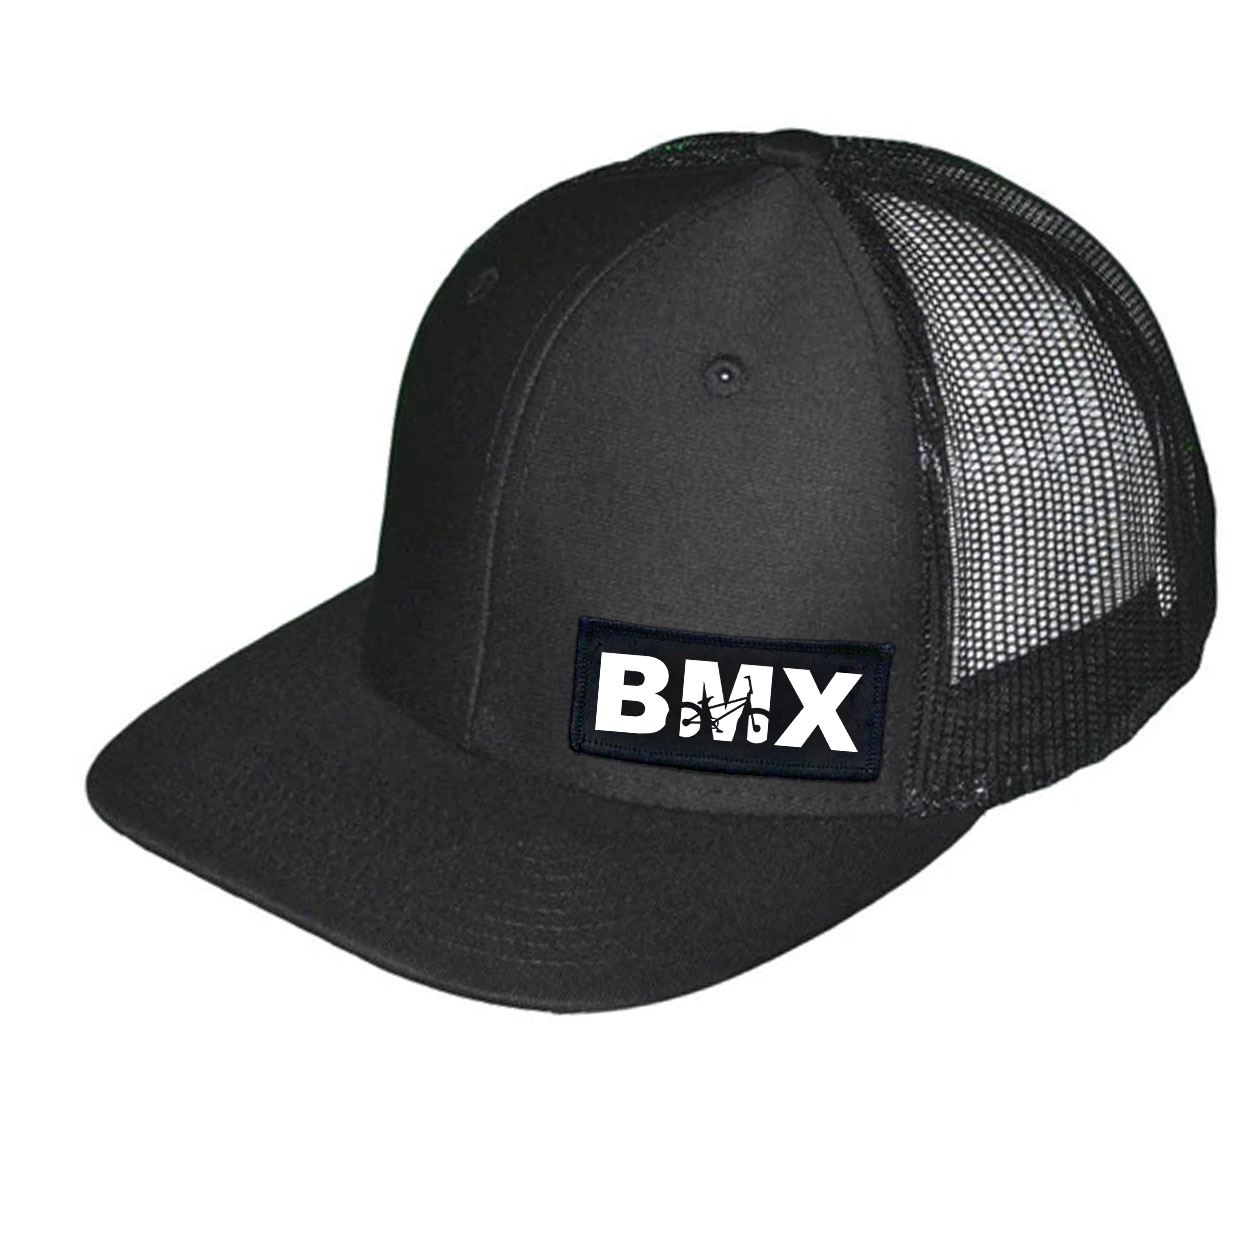 BMX Bike Logo Night Out Woven Patch Snapback Trucker Hat Black (White Logo)